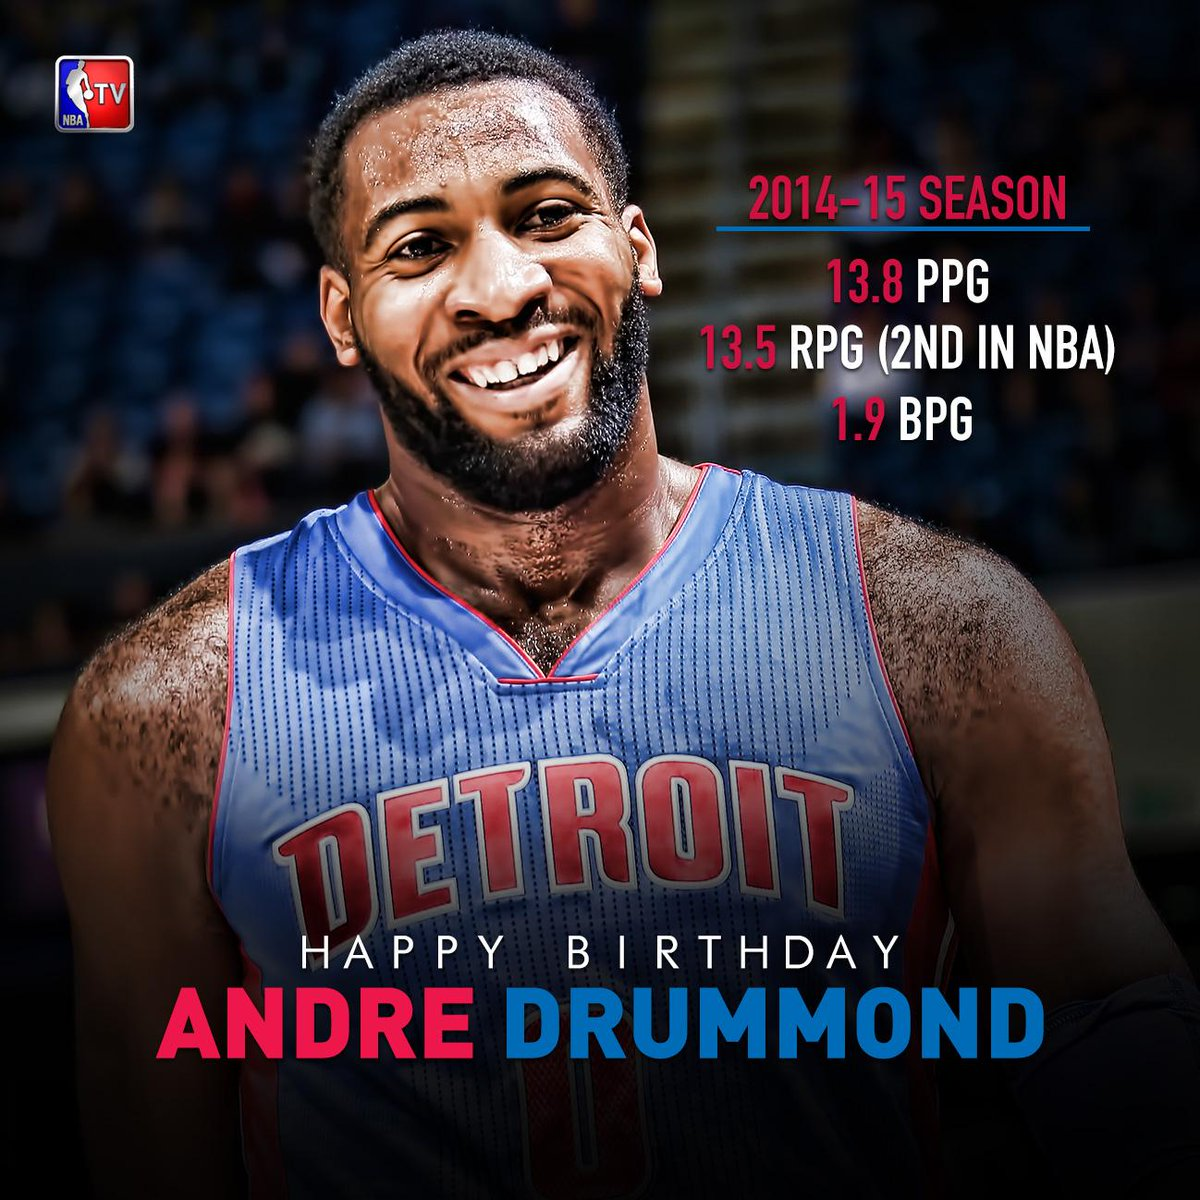 Happy Birthday @andredrummondd! The @detroitpistons Big